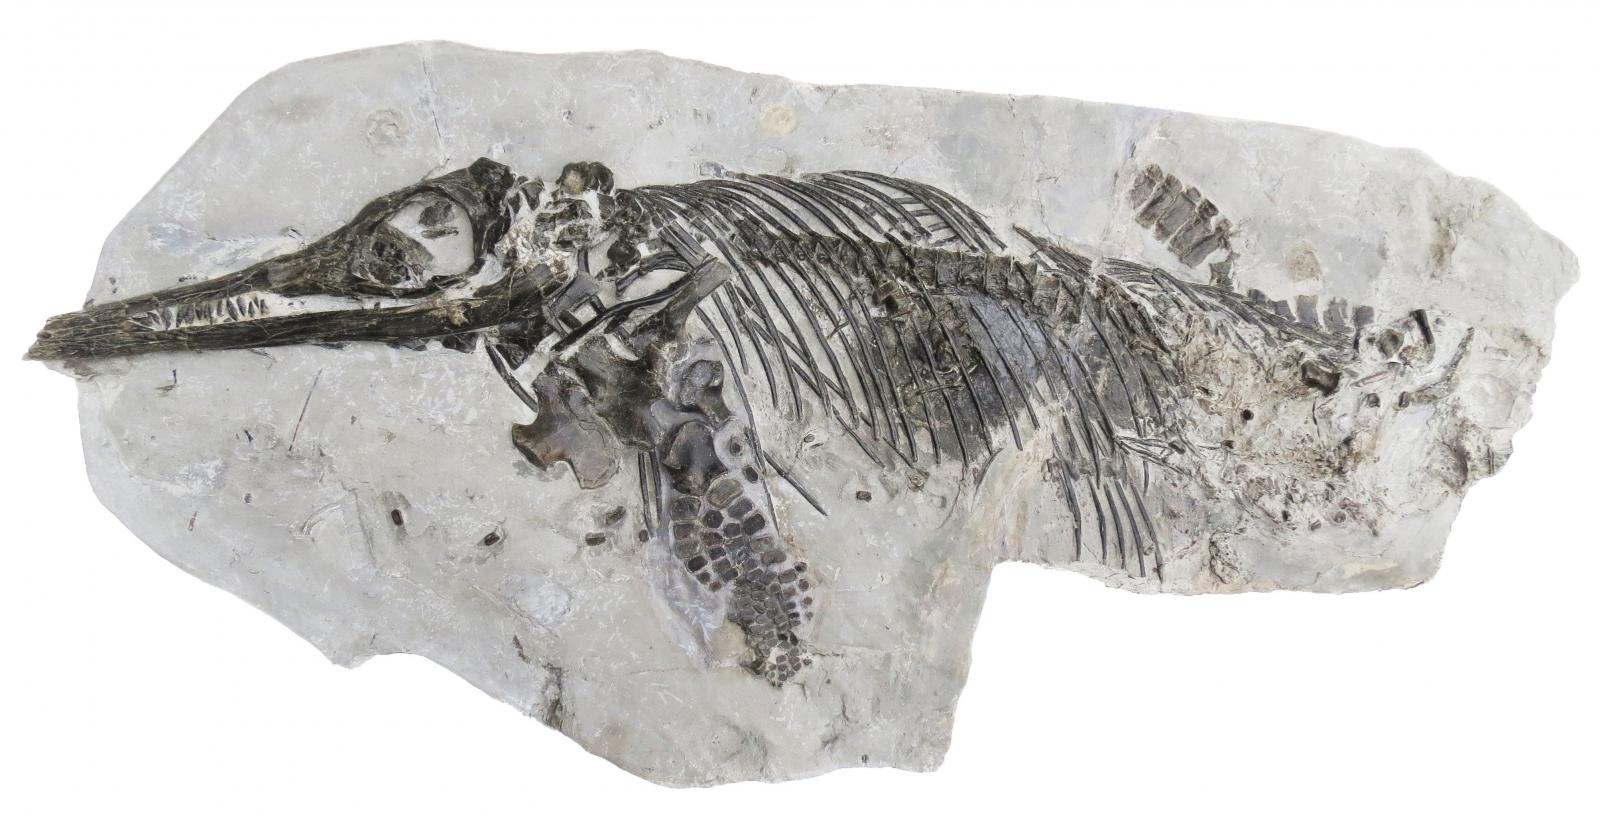 Ichthyosaurus anningae